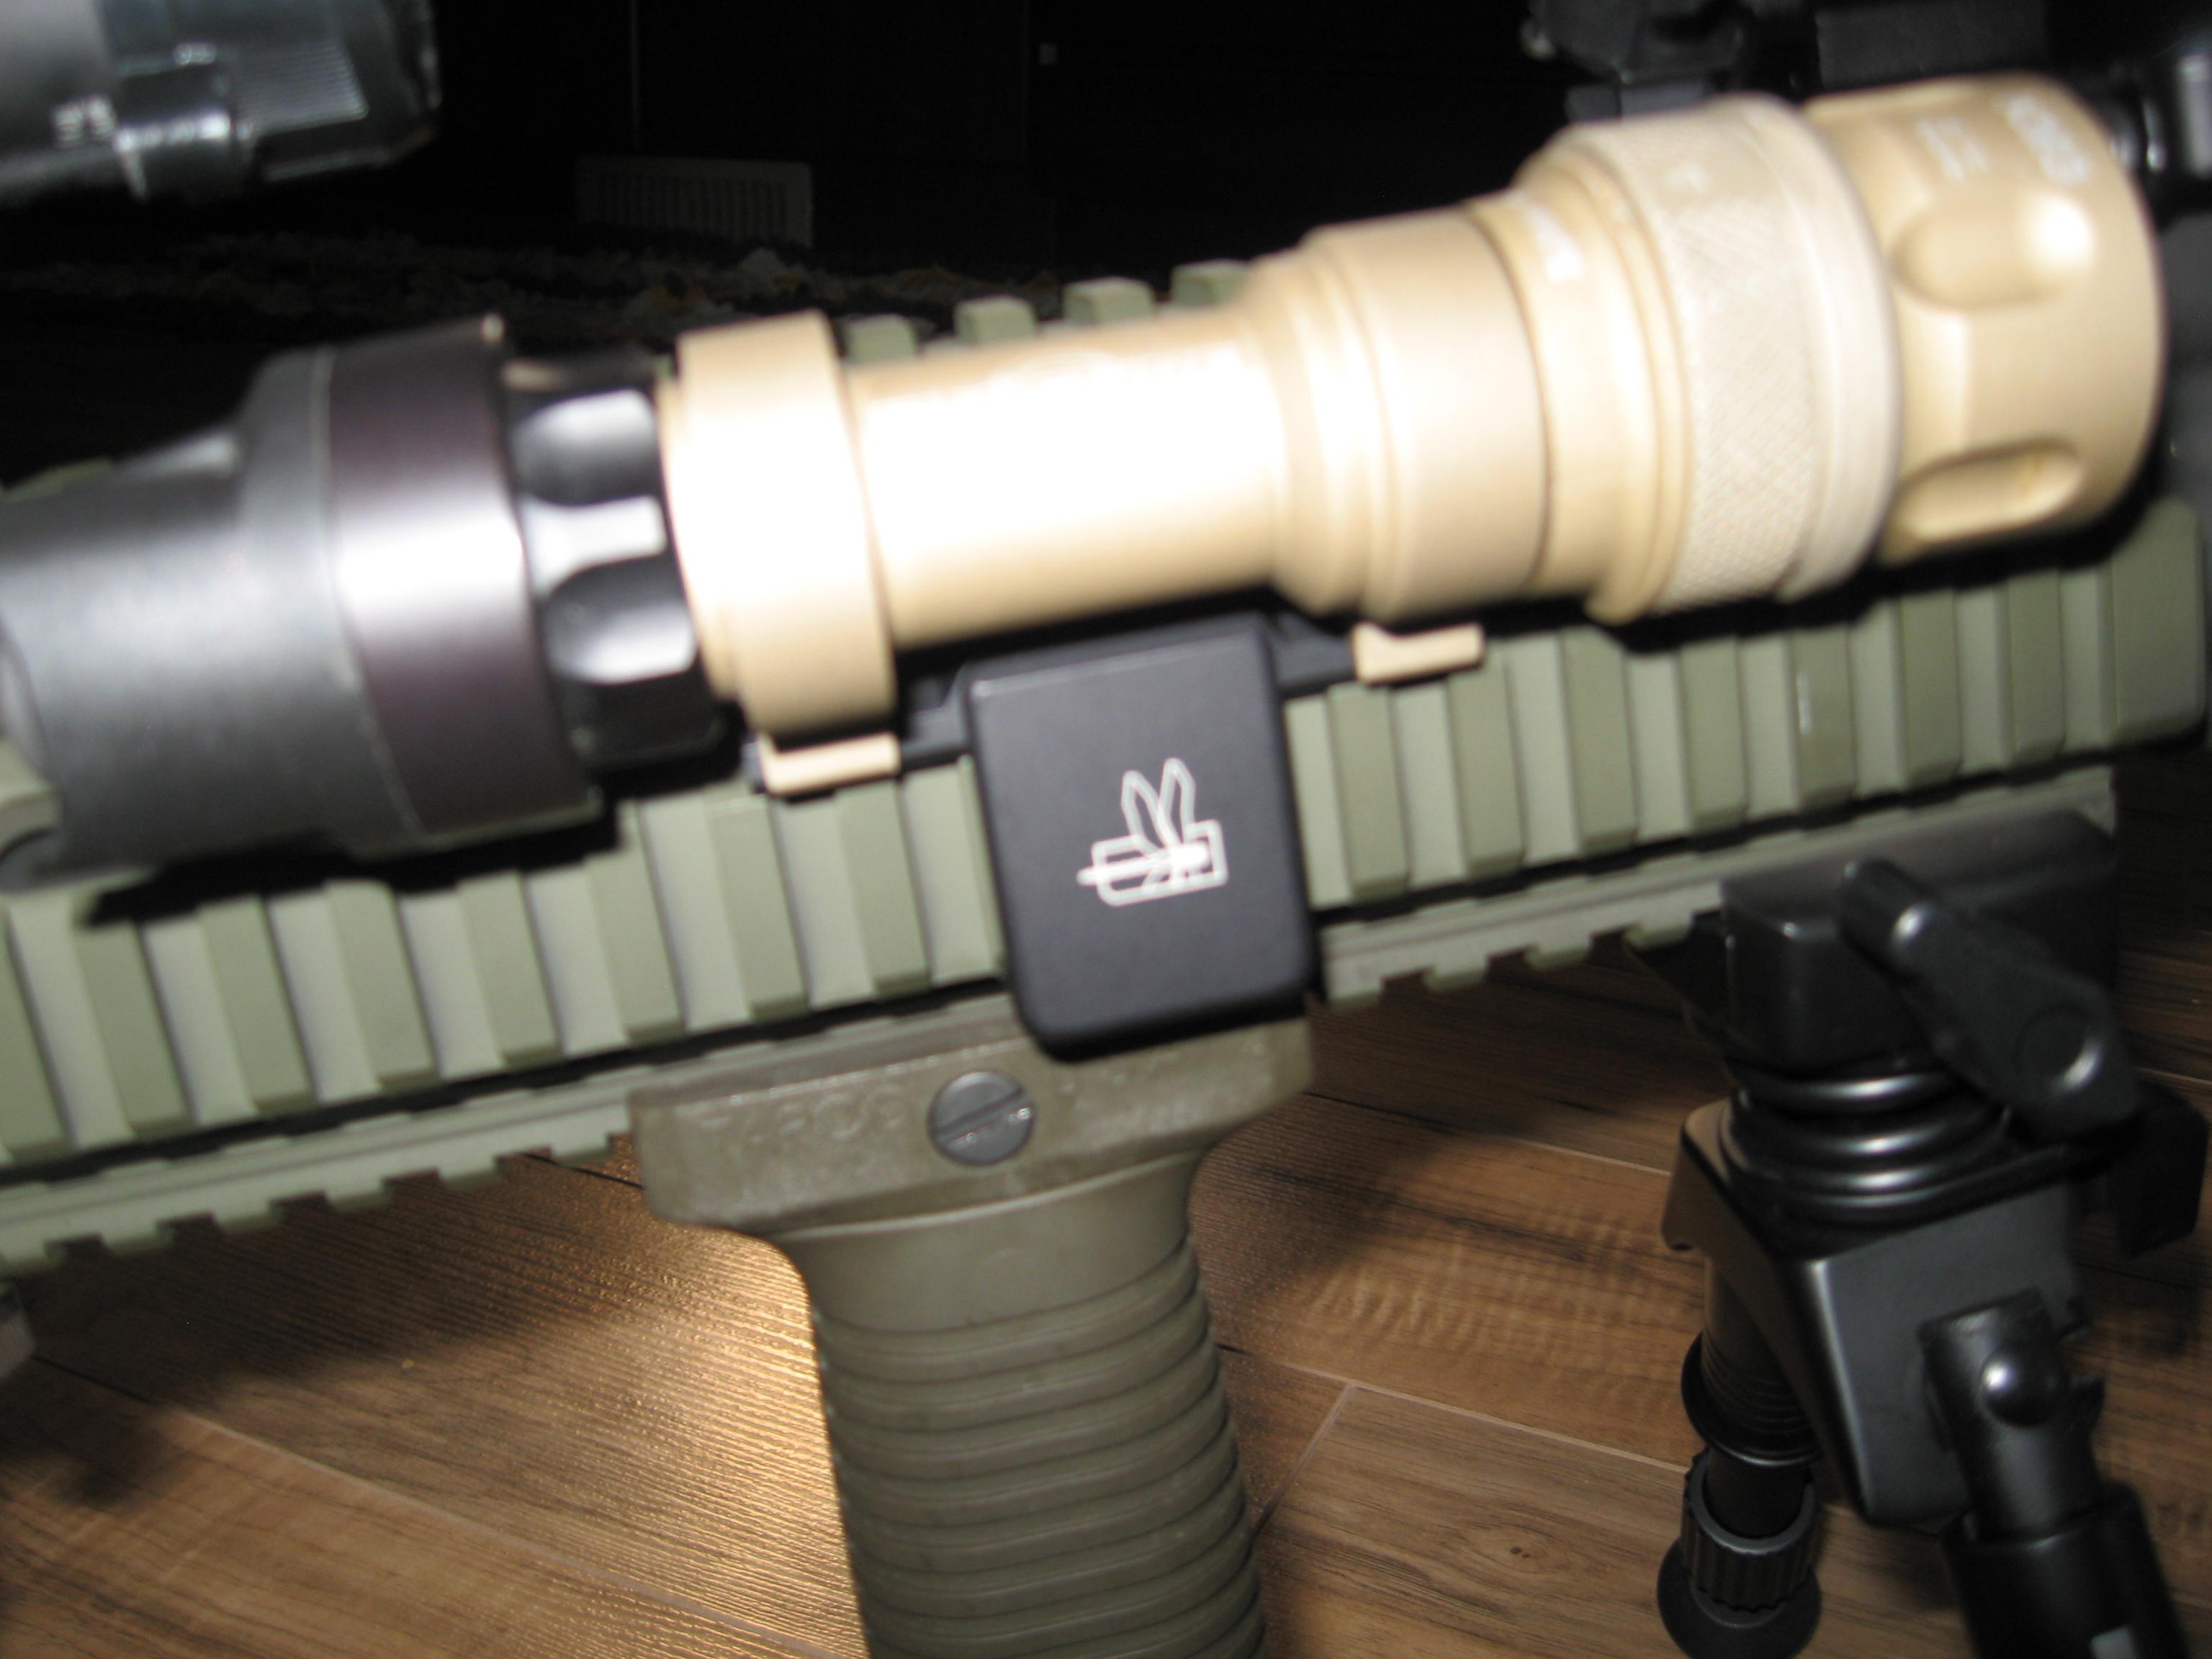 Haley strategic thorntail mount for my surefire-flashlight-mount-005.jpg